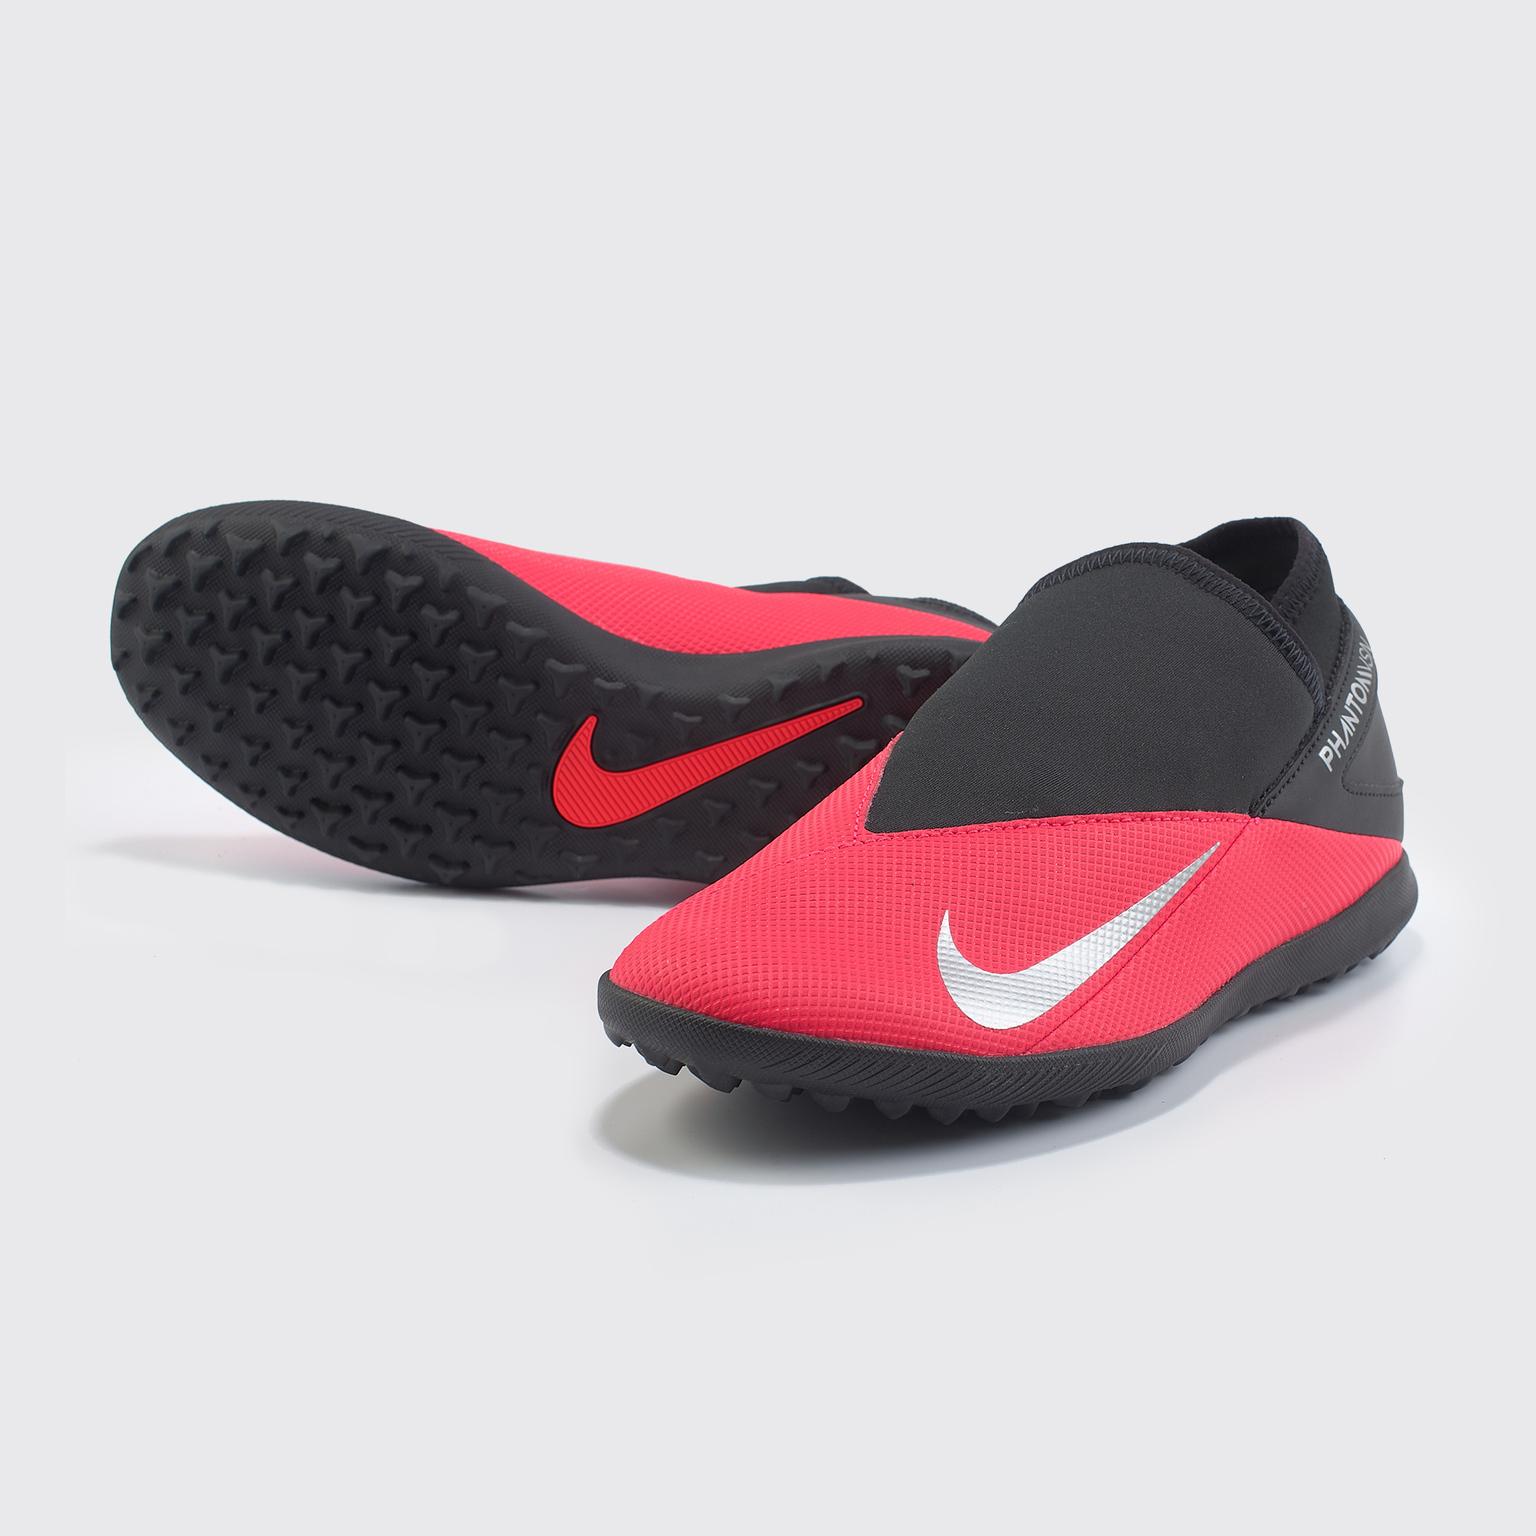 цена Шиповки Nike Phantom Vision 2 Club DF TF CD4173-606 онлайн в 2017 году